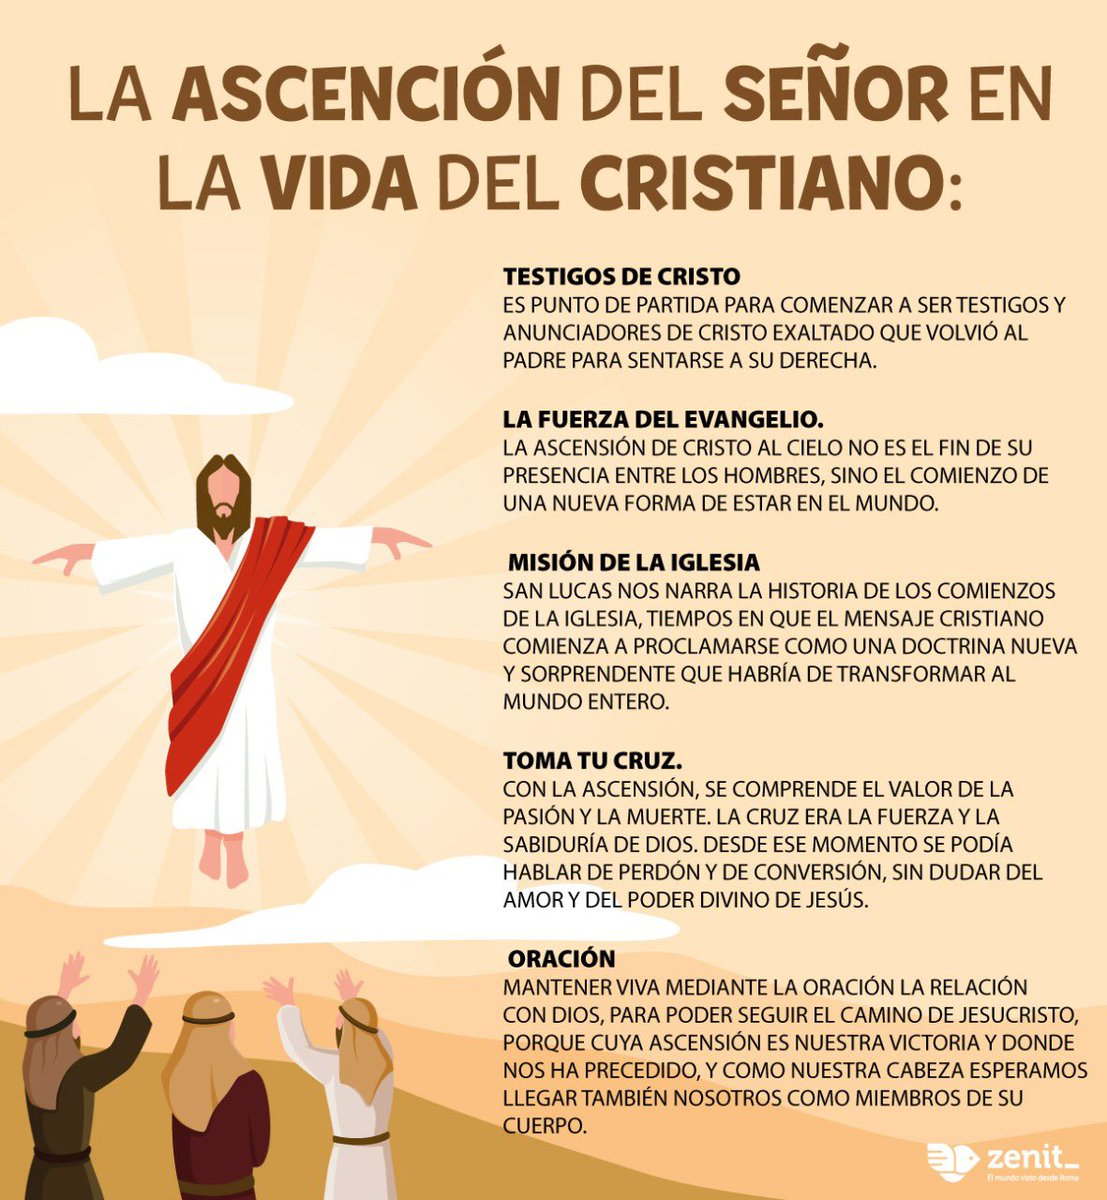 ¿Qué significa la #Ascención de #Jesus para la vida del #cristiano?  #ascensiondelsenor #ascensionday pic.twitter.com/RUM5EBwevK